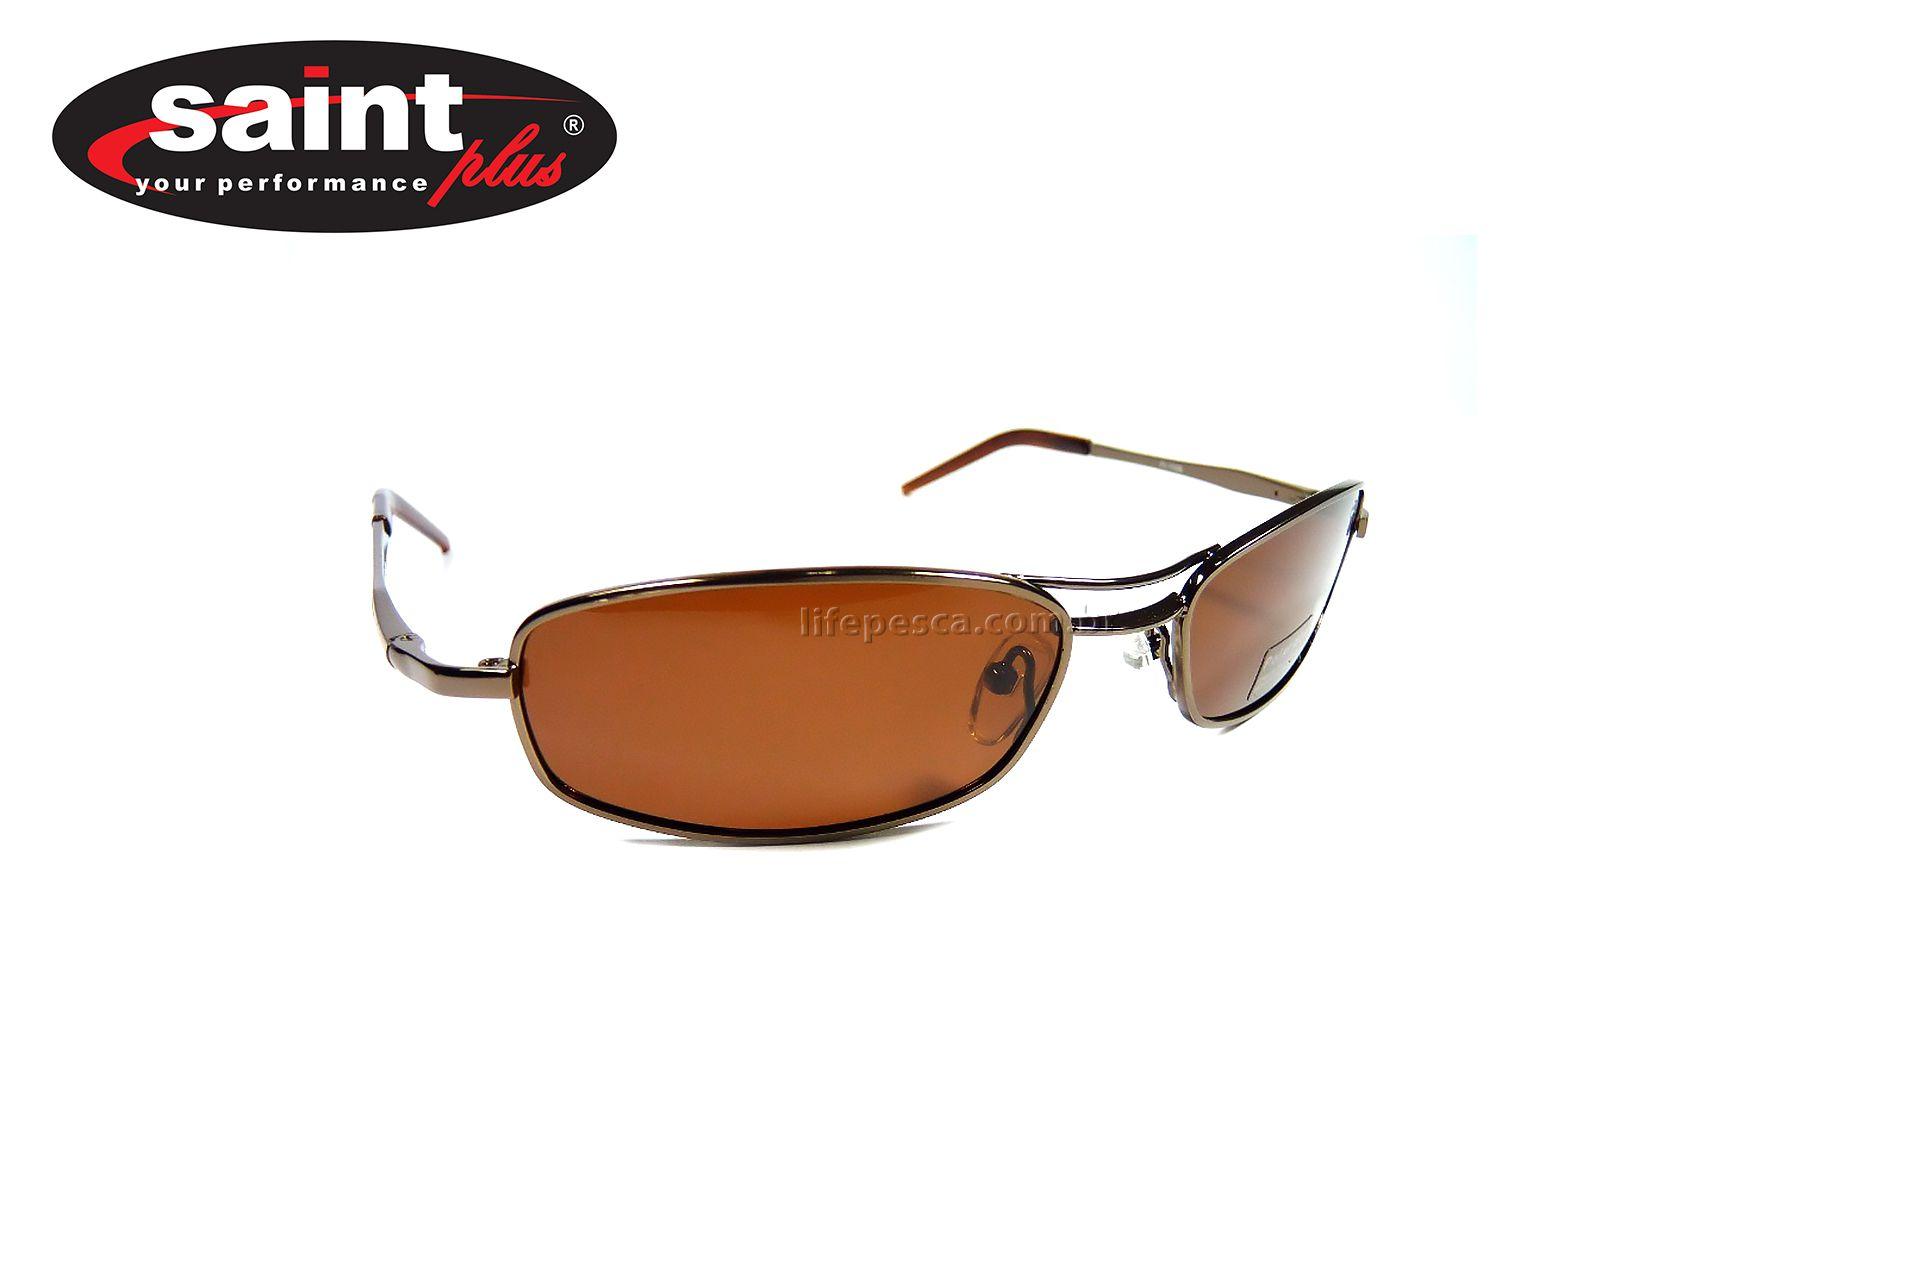 88b067aa2 Óculos Polarizado Saint 100% Proteção Uv - Aluminium 1004